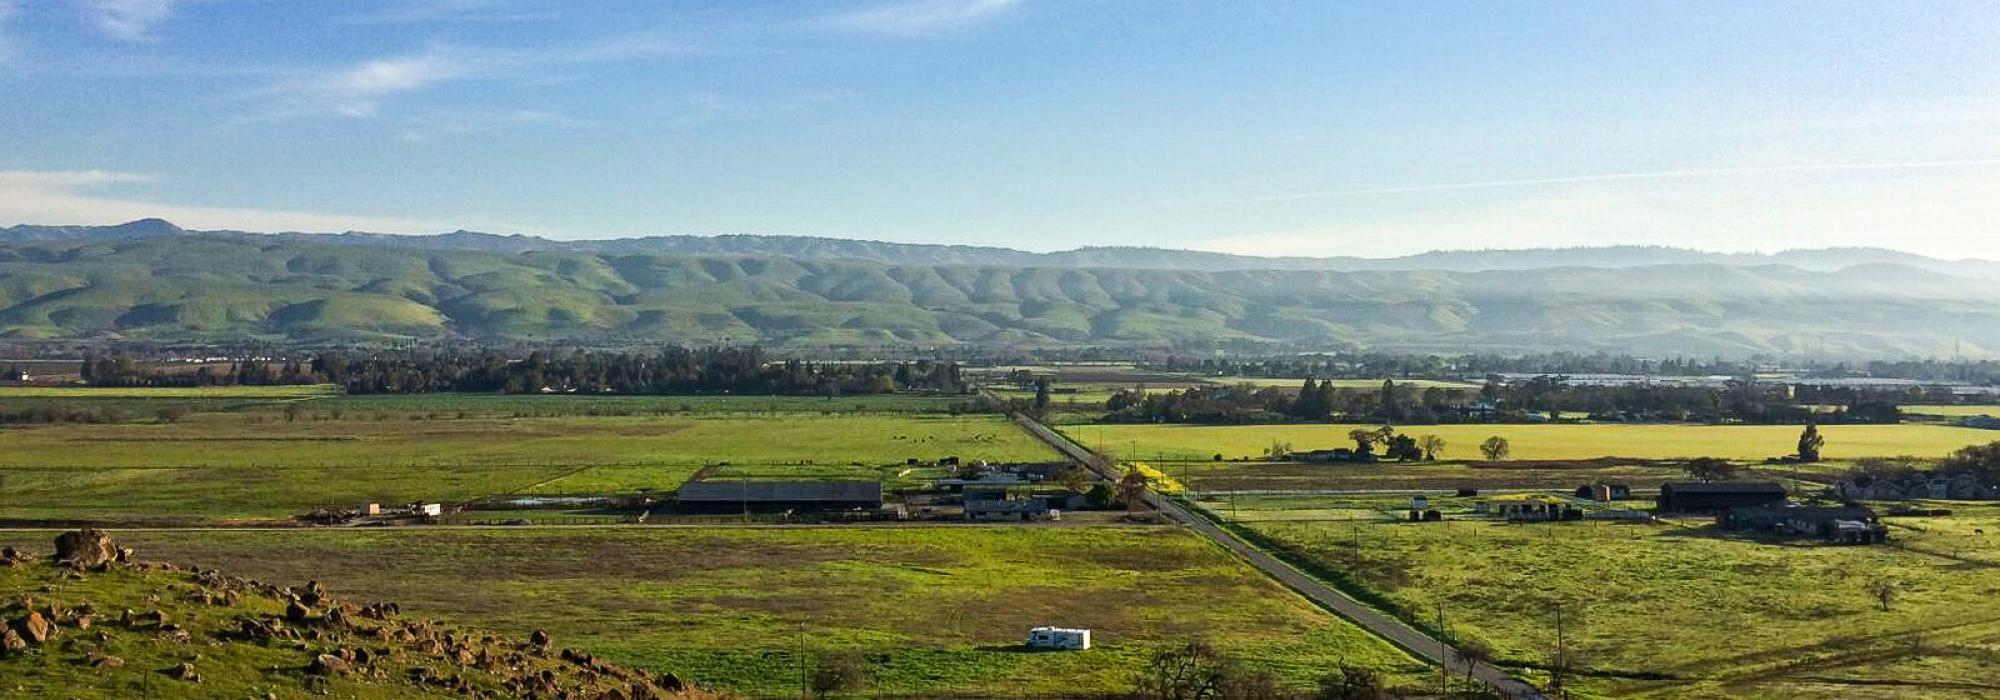 Coyote Valley Credit_ Committee For Green Foothills cv 1_HERO.jpg